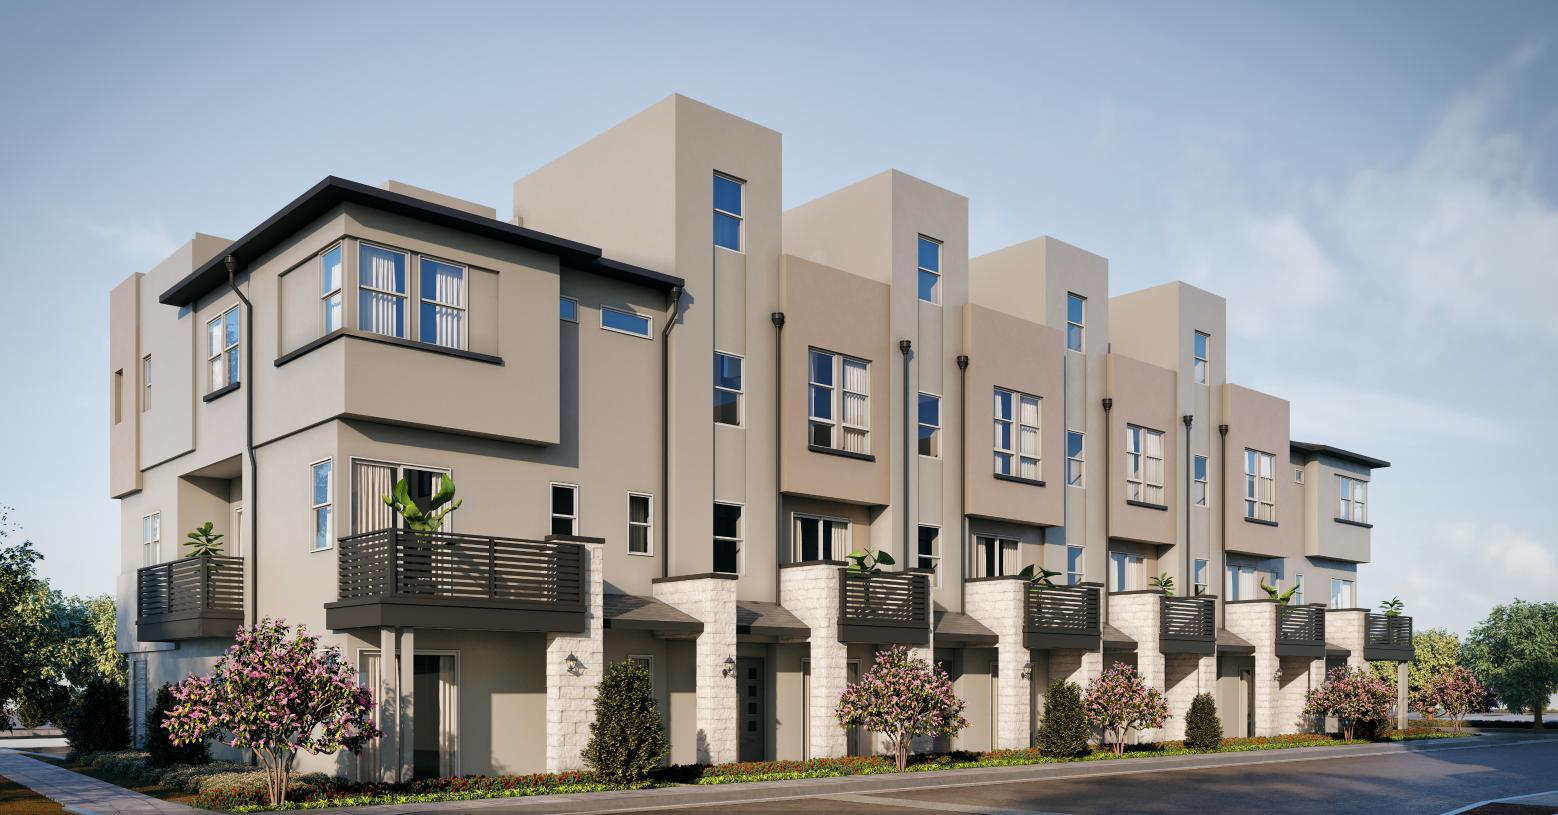 Terraces 3 - Exterior